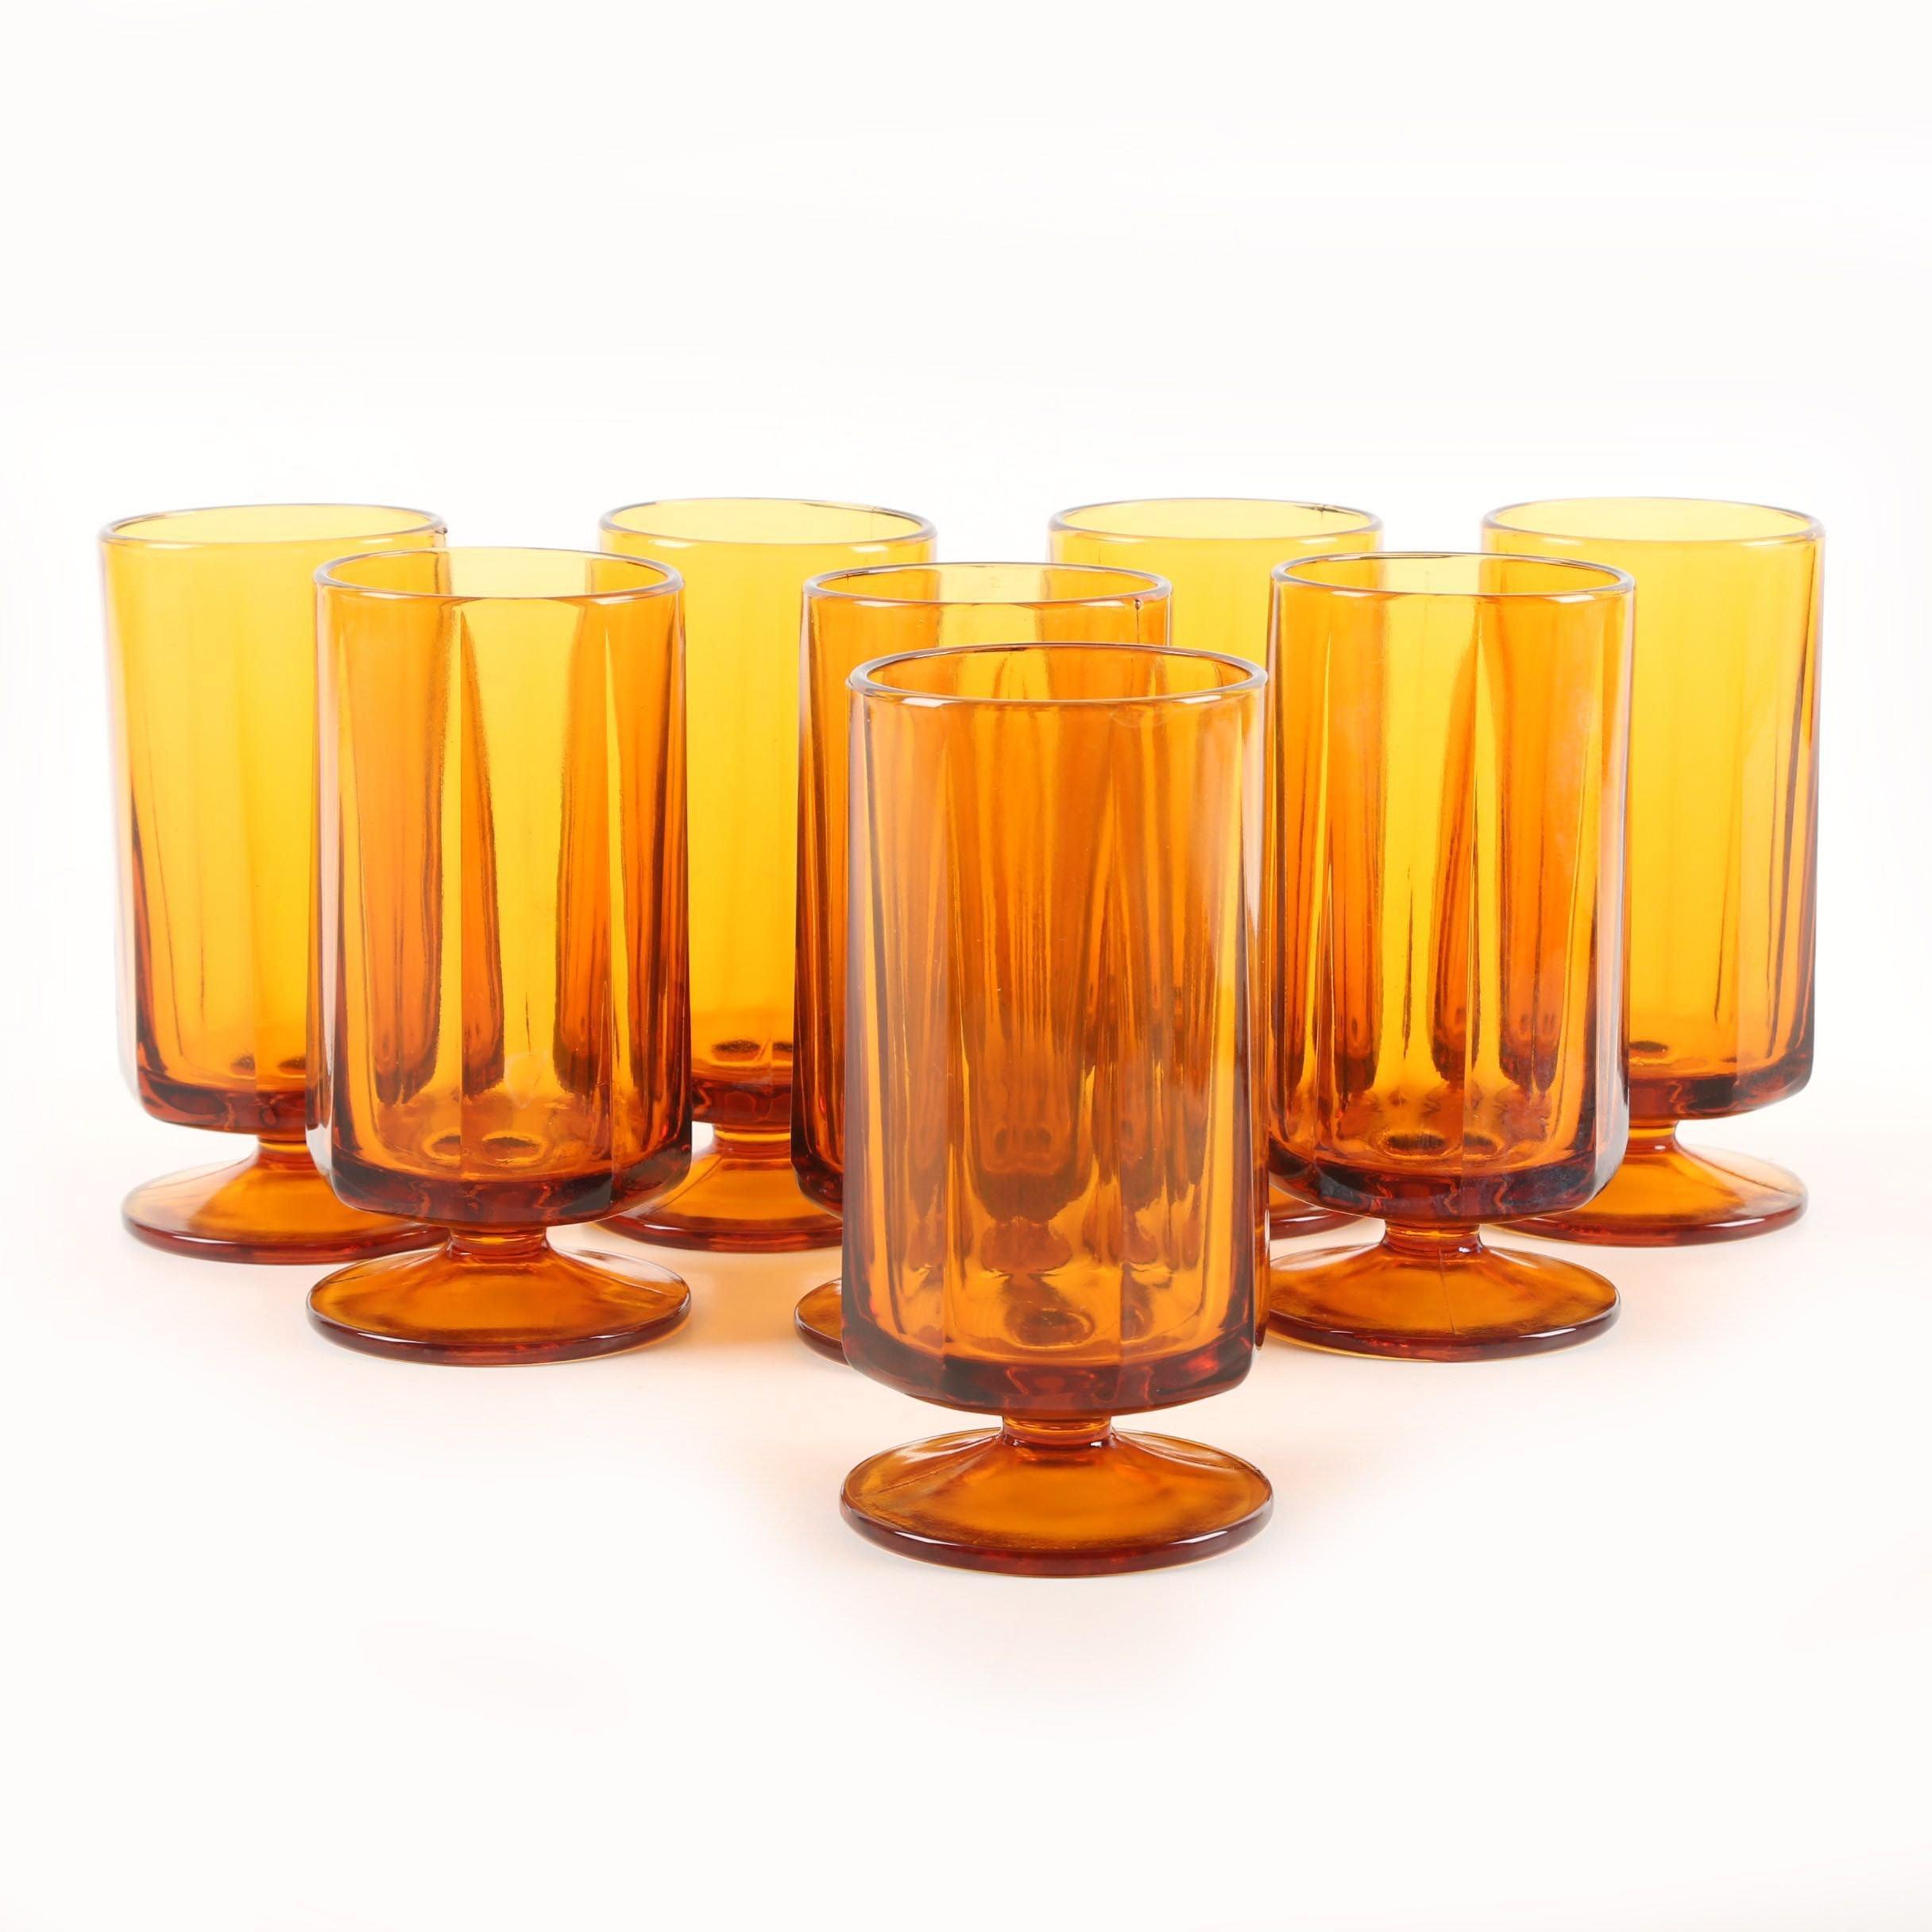 Vintage Amber Glass Footed Goblets